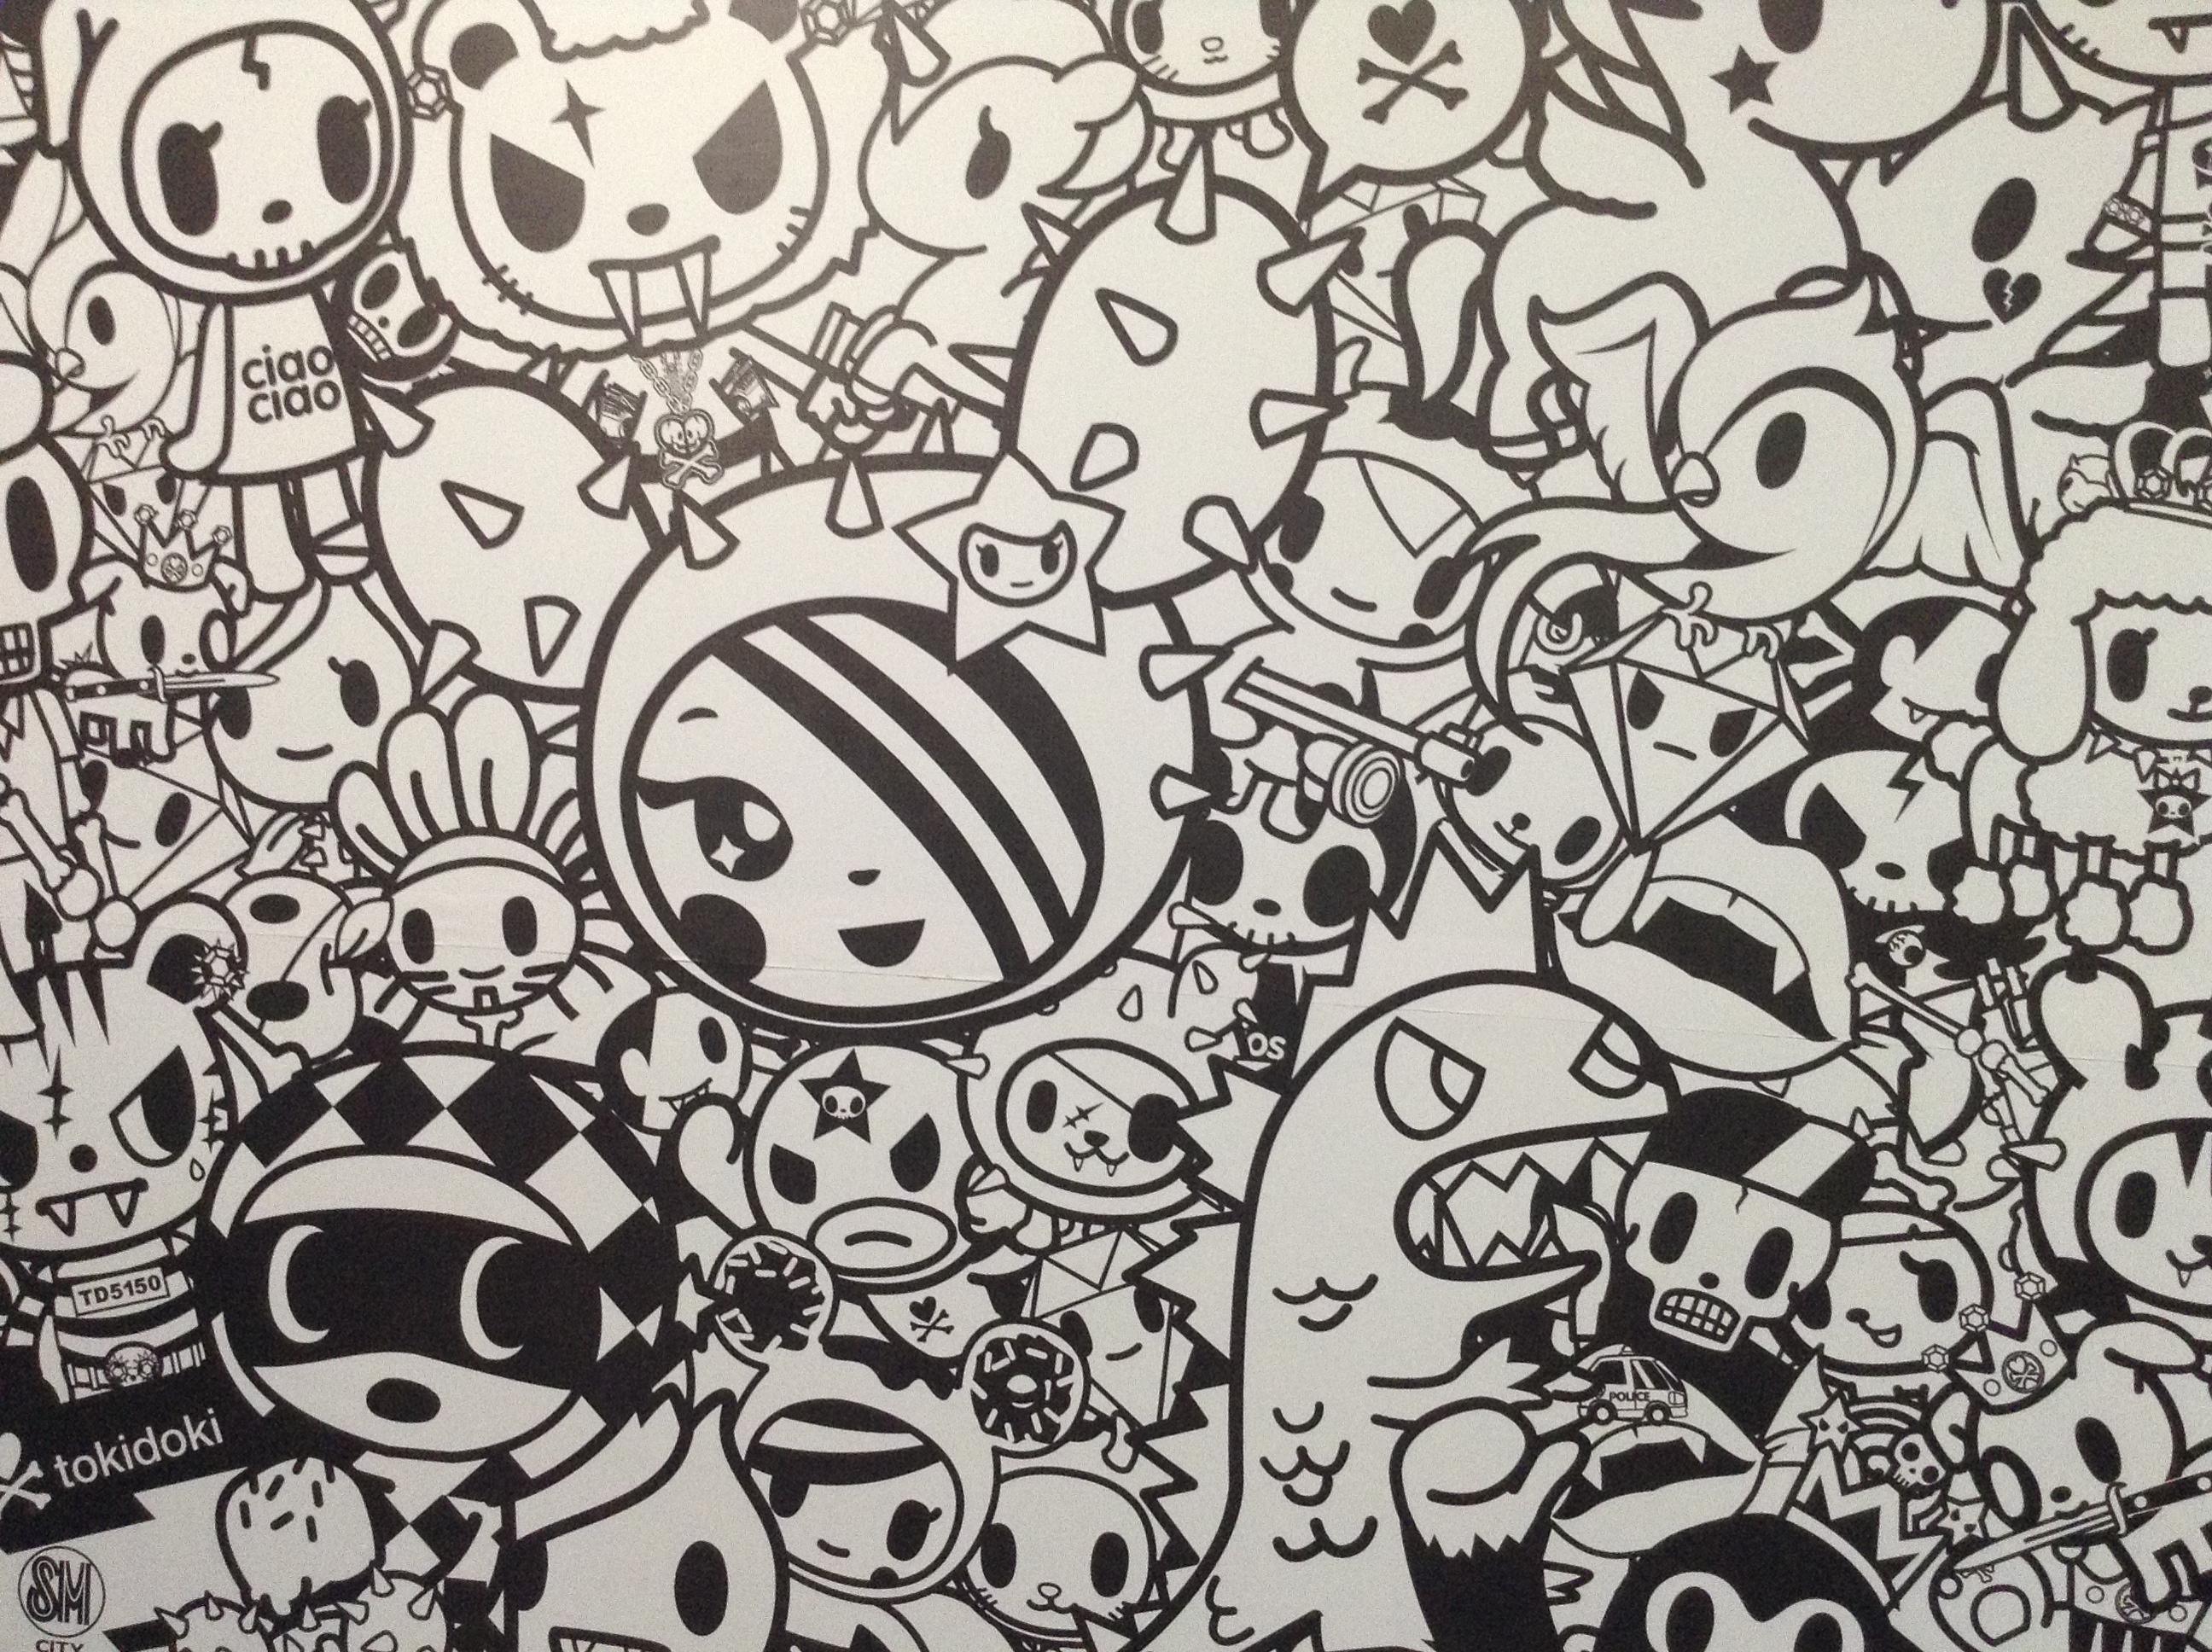 Cute Kawaii Wallpaper Hd Tokidoki Wallpapers Download Free Pixelstalk Net